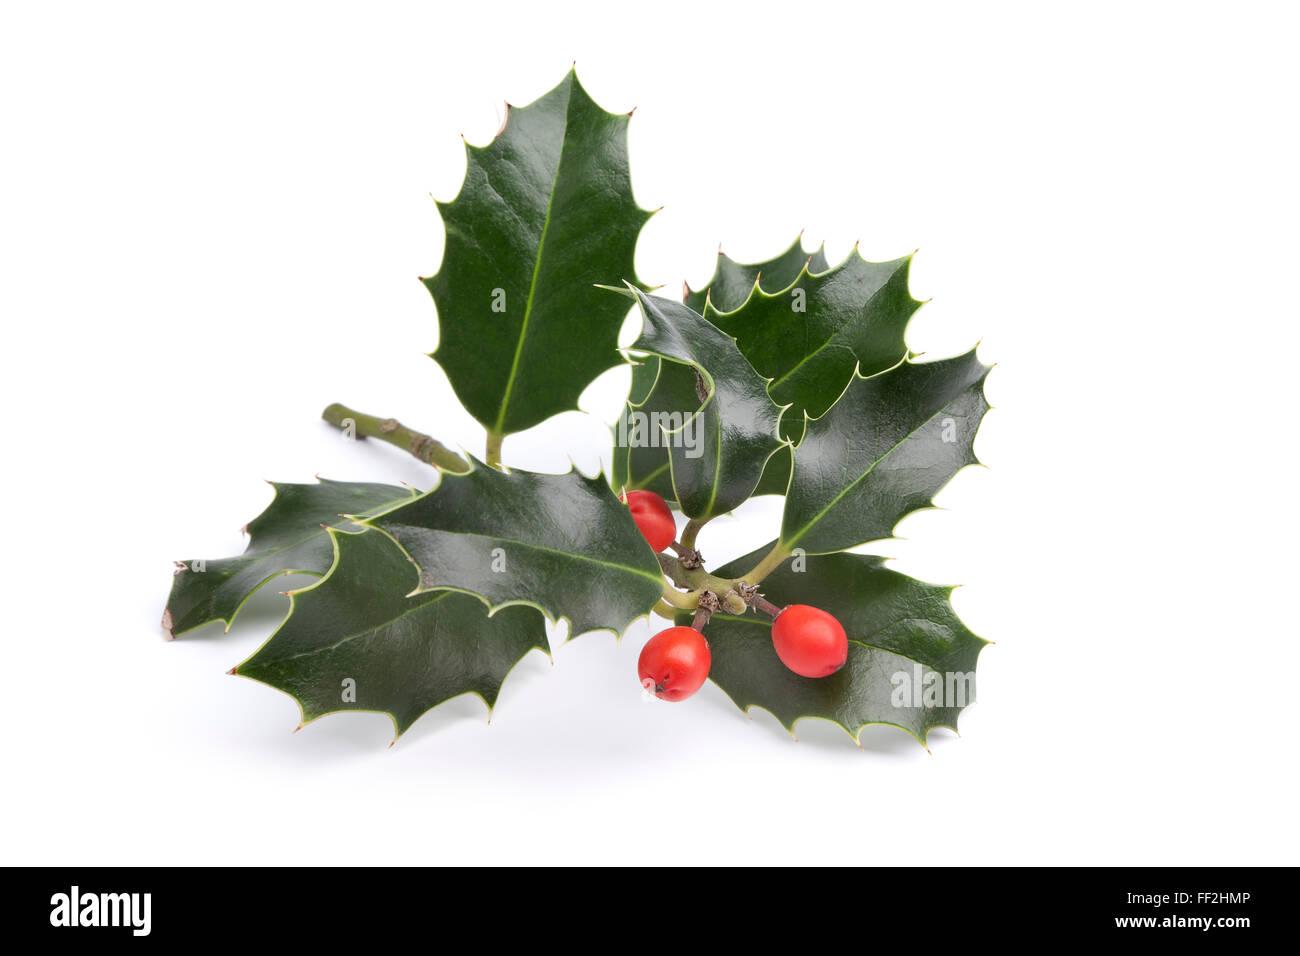 Twig of fresh Holly on white background - Stock Image